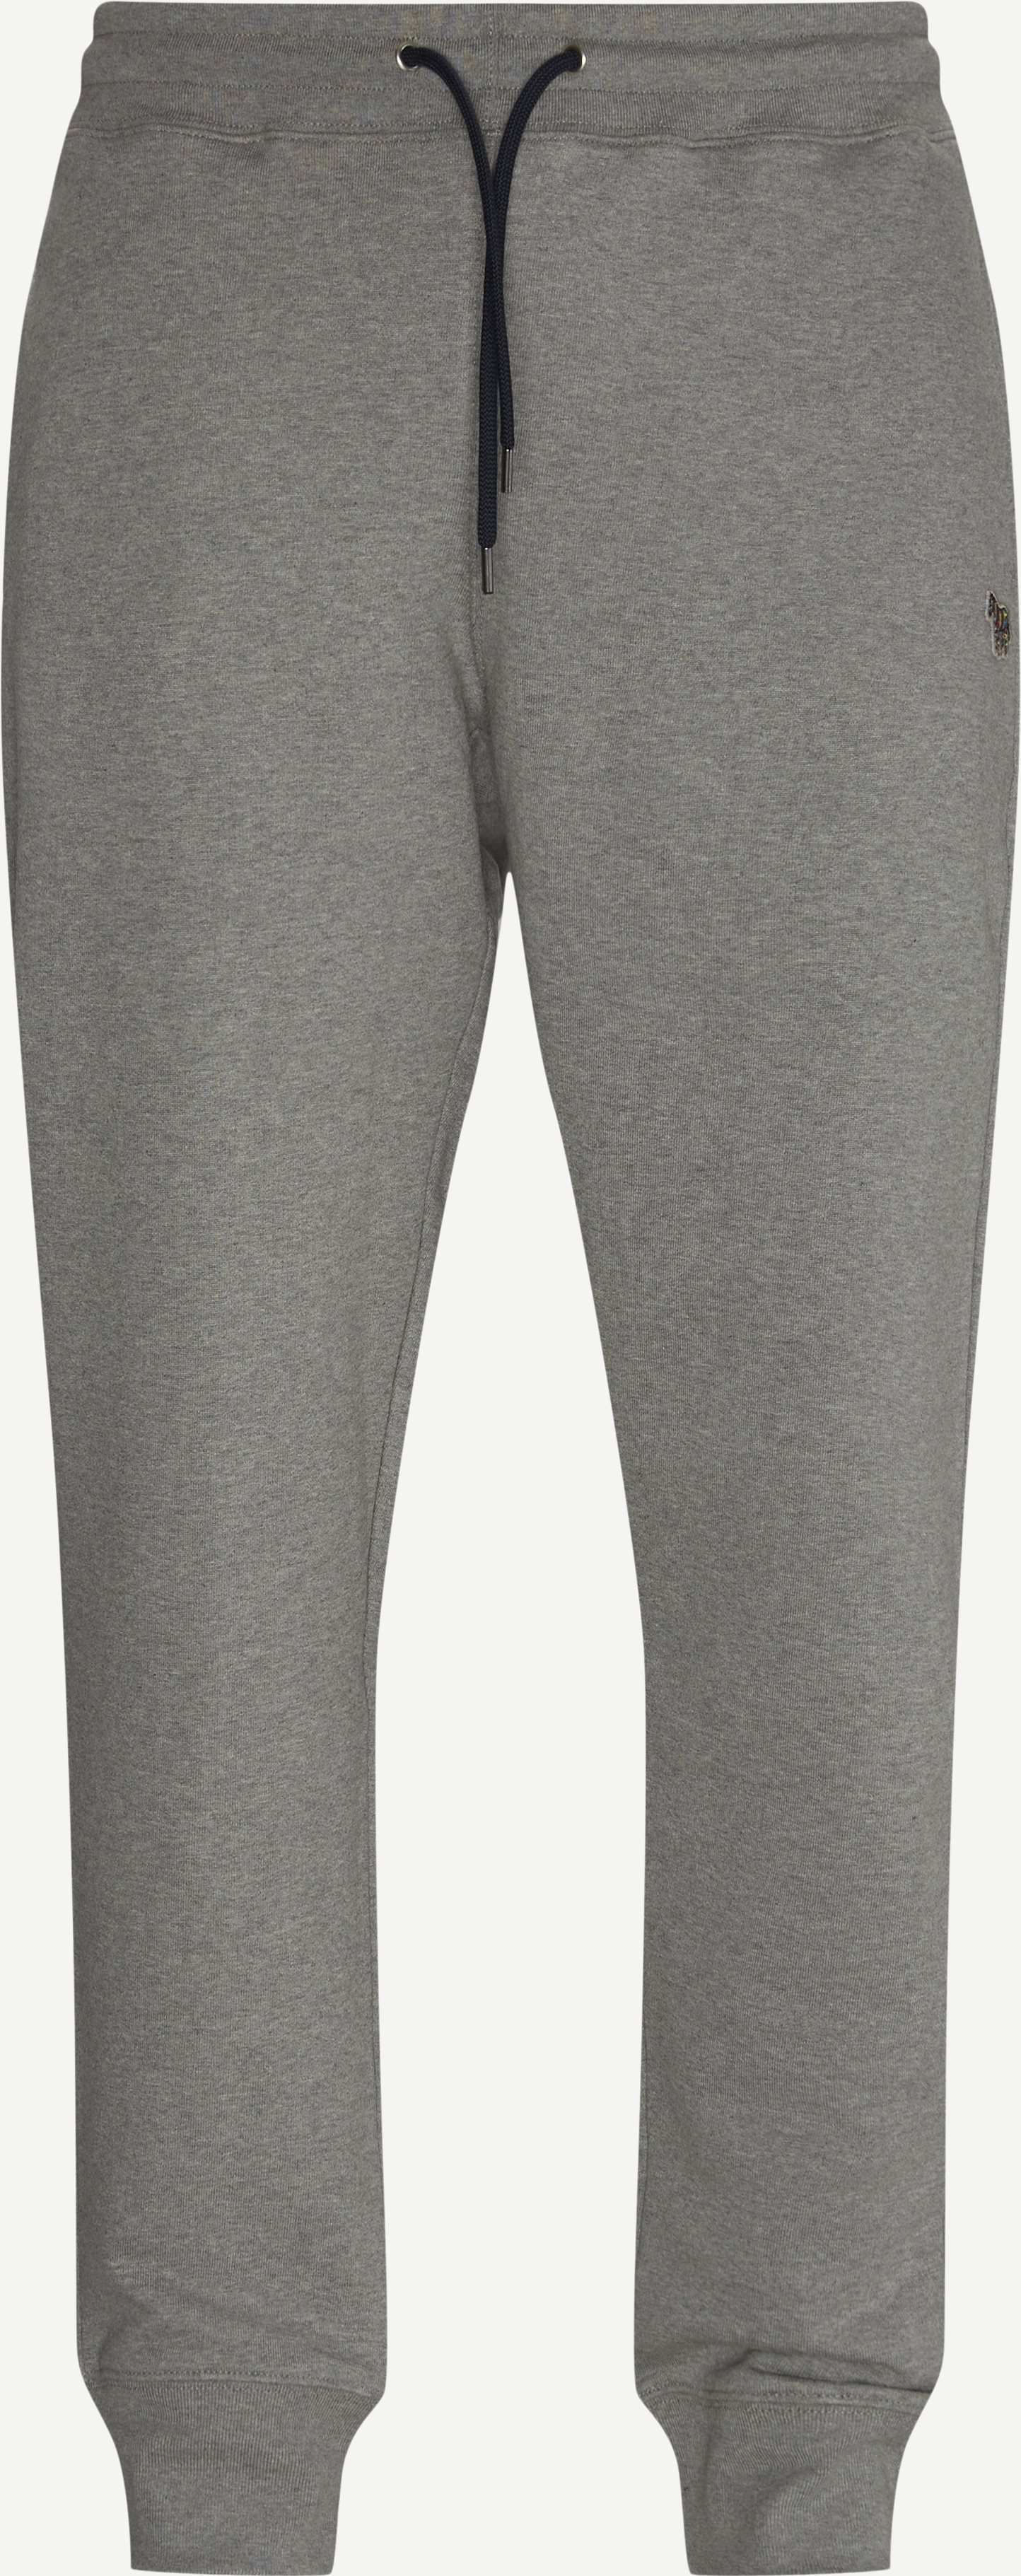 Hosen - Regular fit - Grau